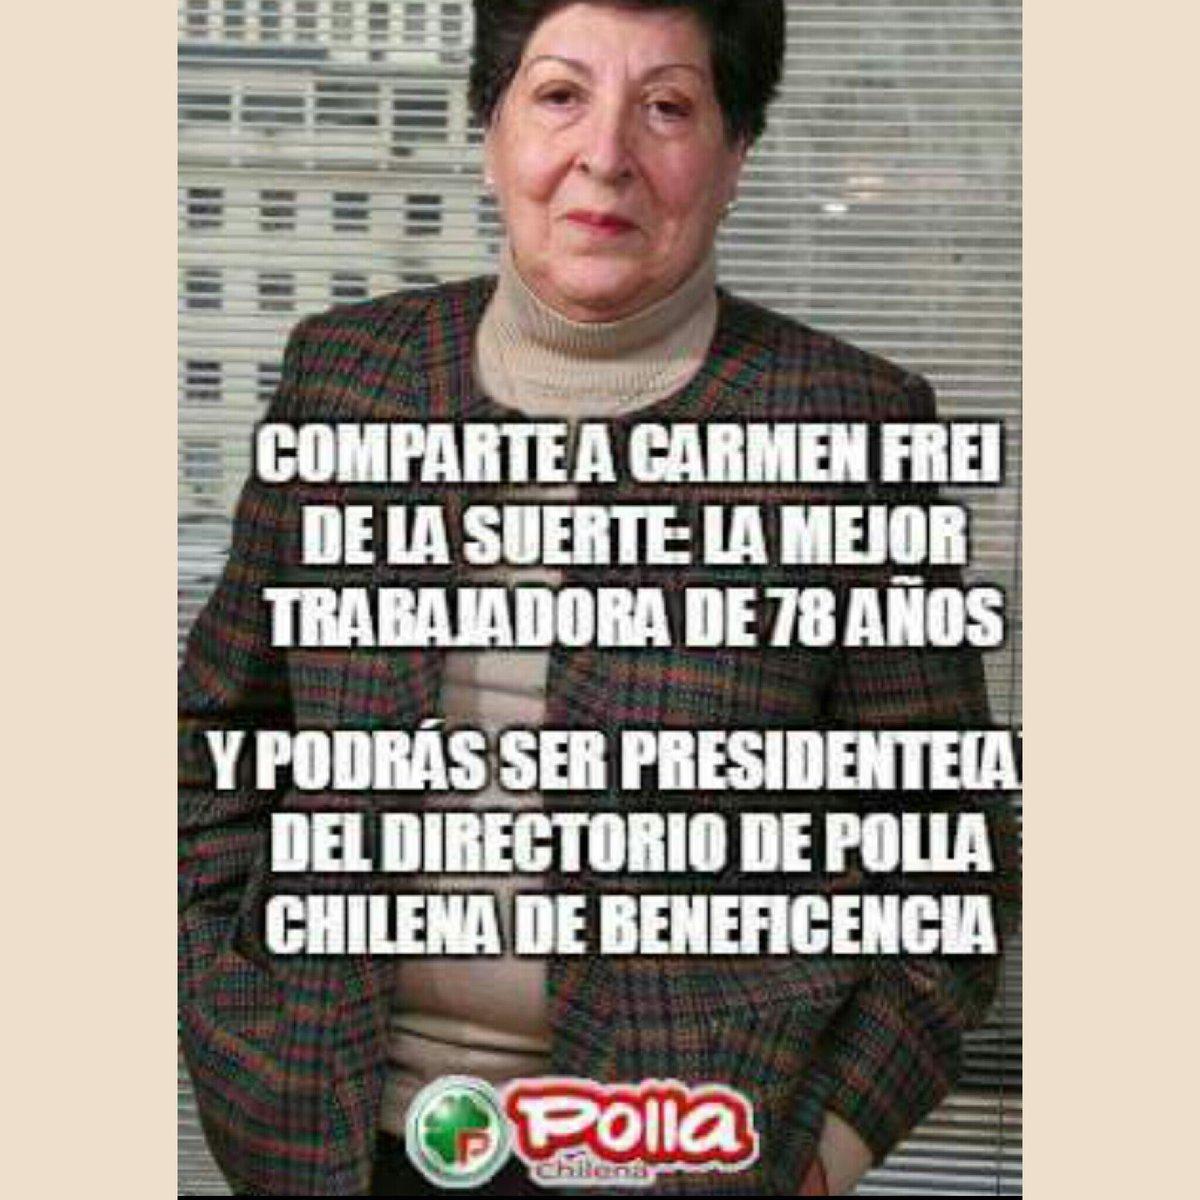 #AmnesiaChilena Otro robo: ella es Parvu...